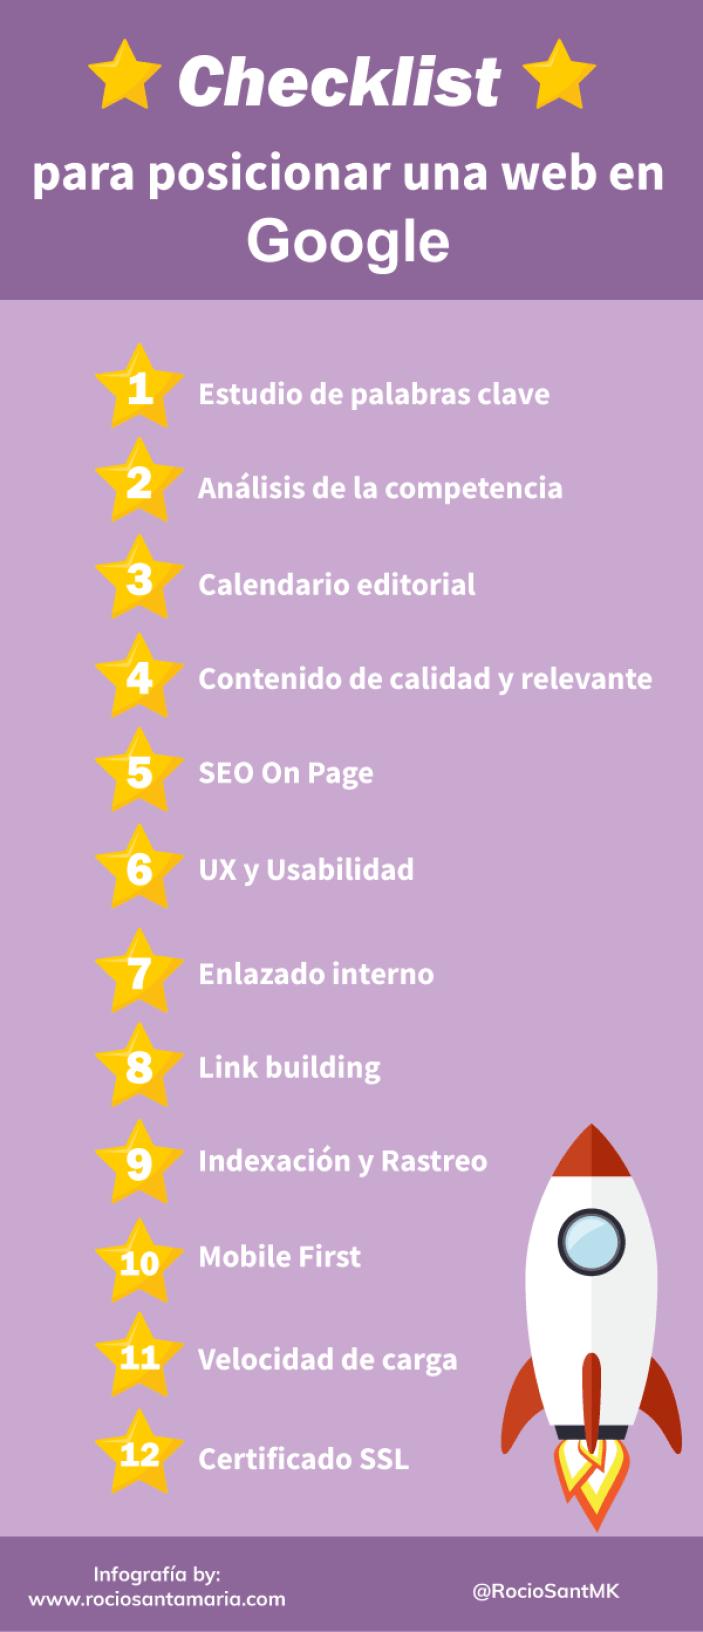 Checklist para posiciones tu web en Google #infografia #infographic #seo